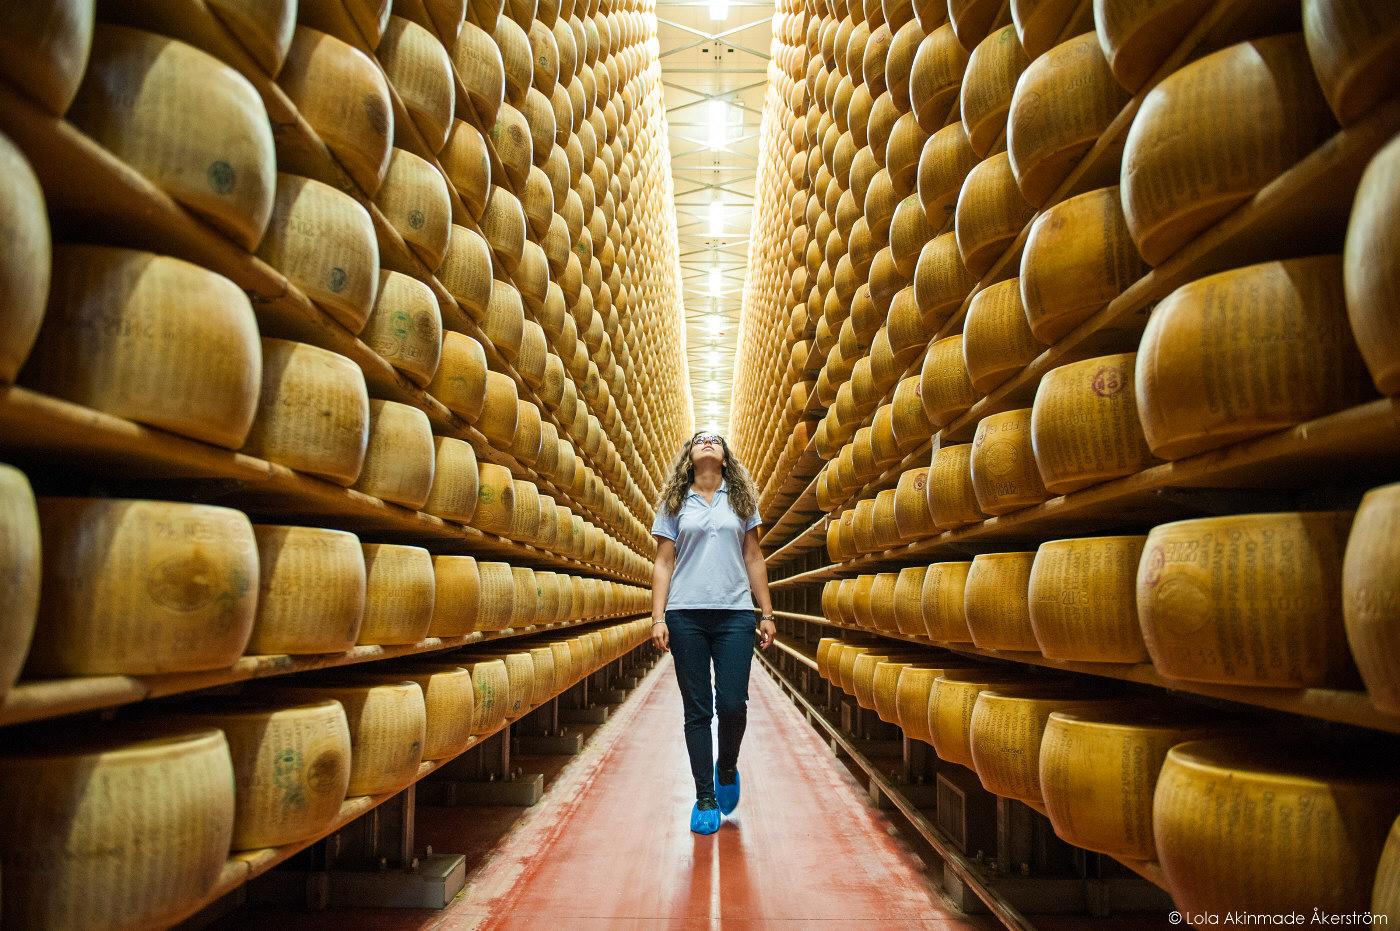 Wheels of Parmesan Cheese